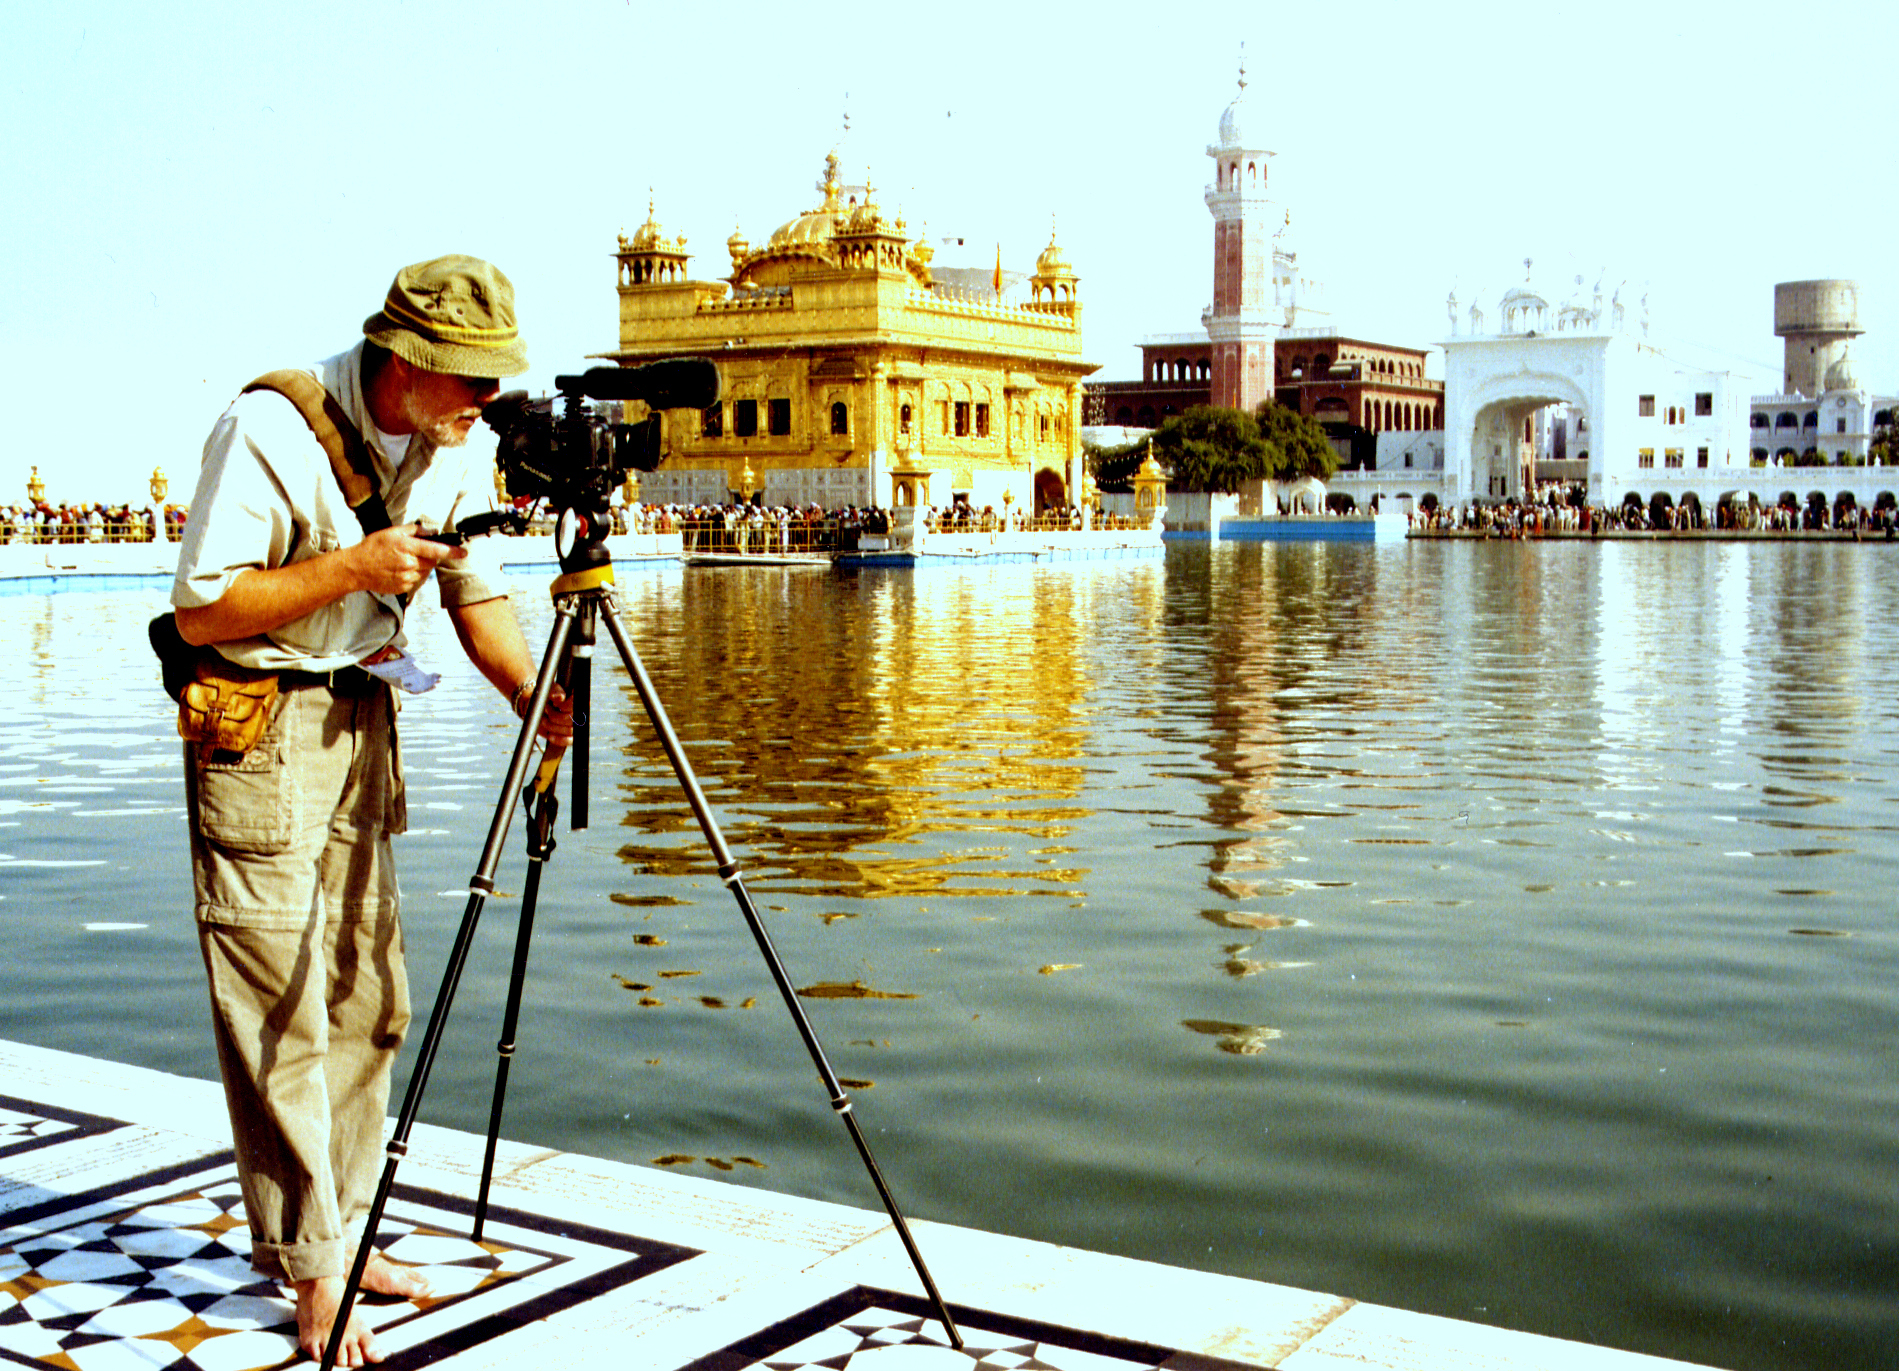 Der Goldene Tempel - Heiligtum der Sikhs - Amritsar, Indien